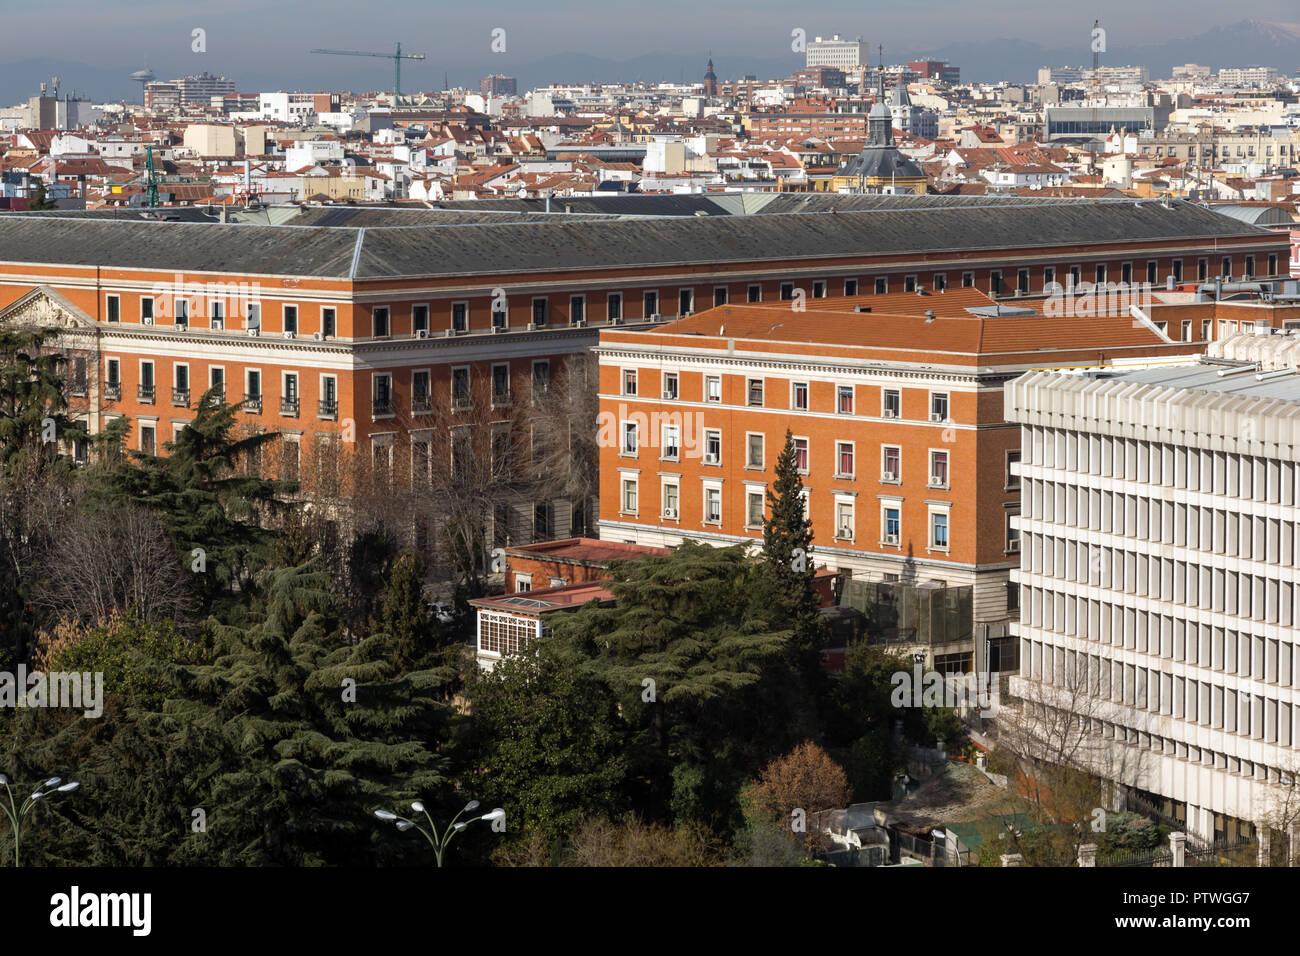 Madrid Spain January 24 2018 Amazing Panorama Of City